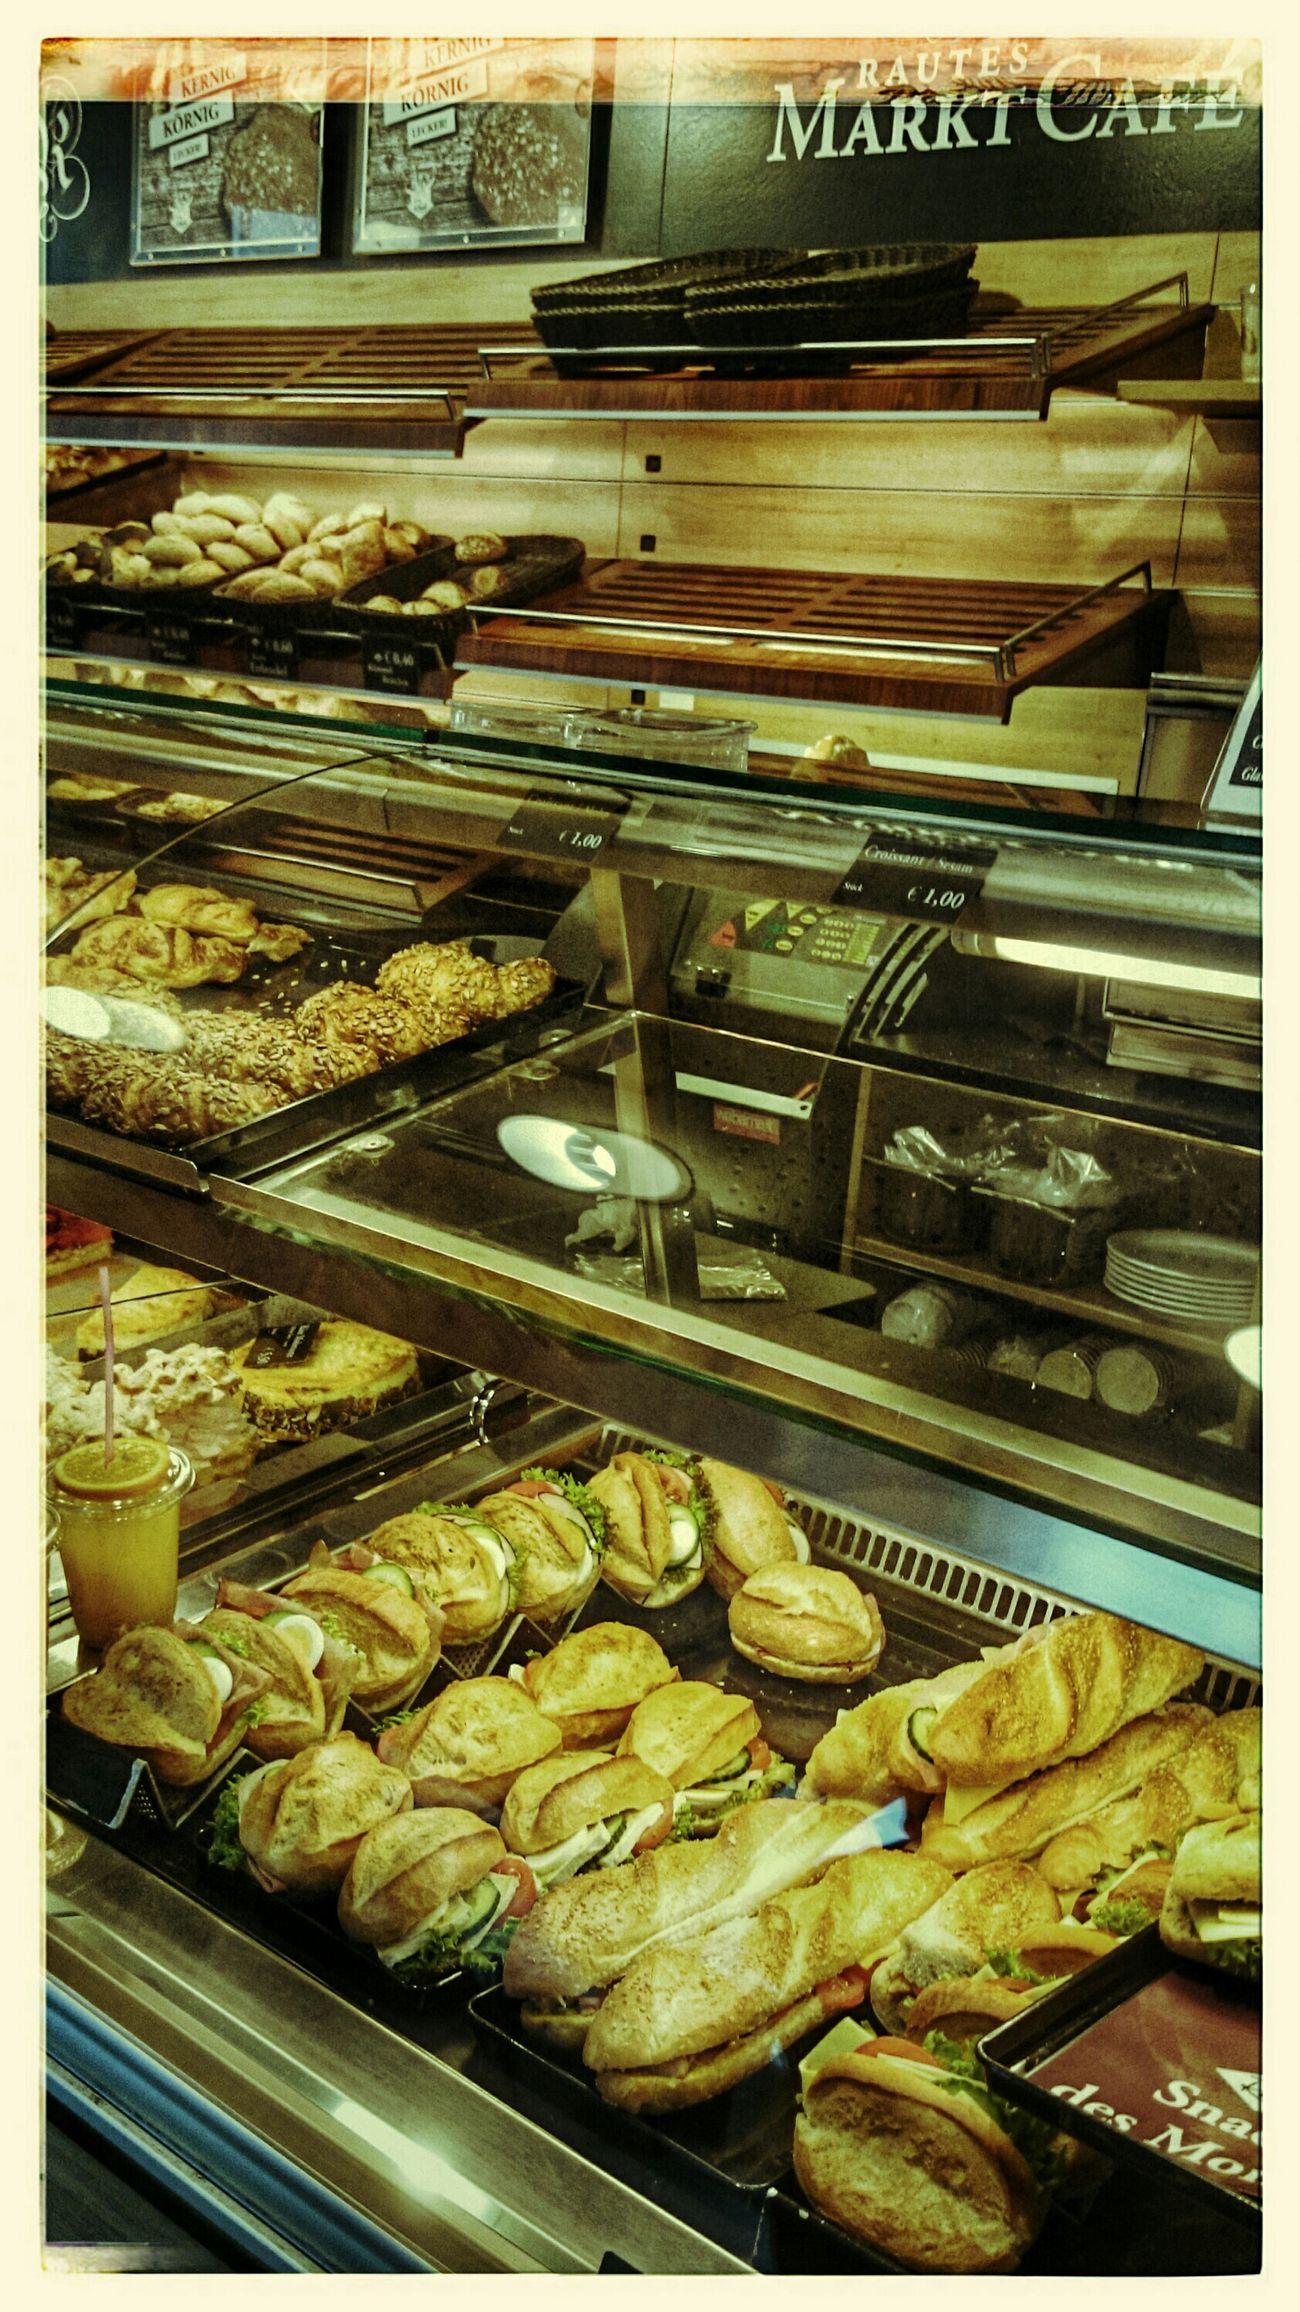 Frühstücksauswahl Kaffeepause Breakfast Belegte Brötchen Kuchen